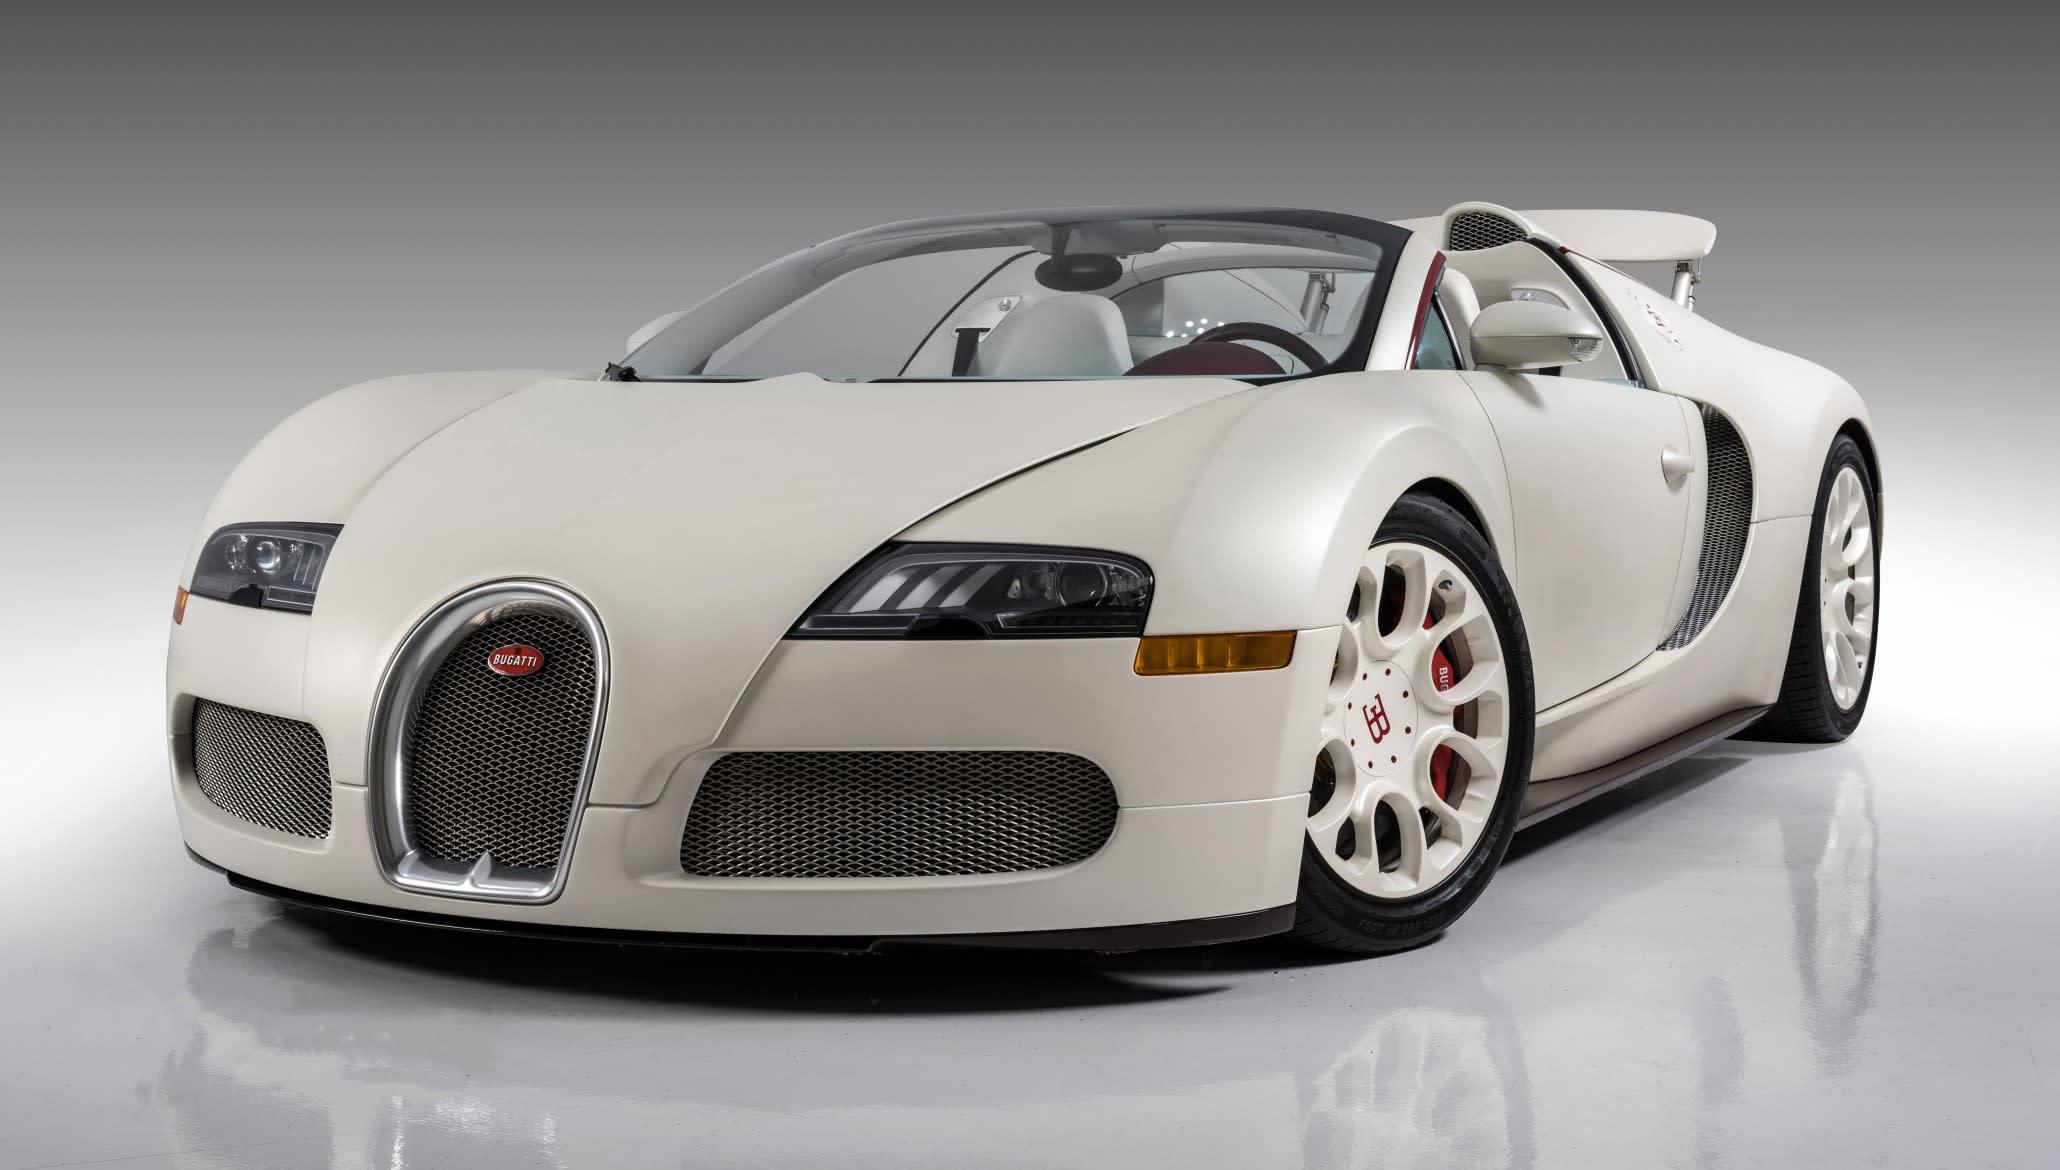 e132207d864be35733948a72e1ea9e1c Fascinating Bugatti Veyron Price south African Rands Cars Trend